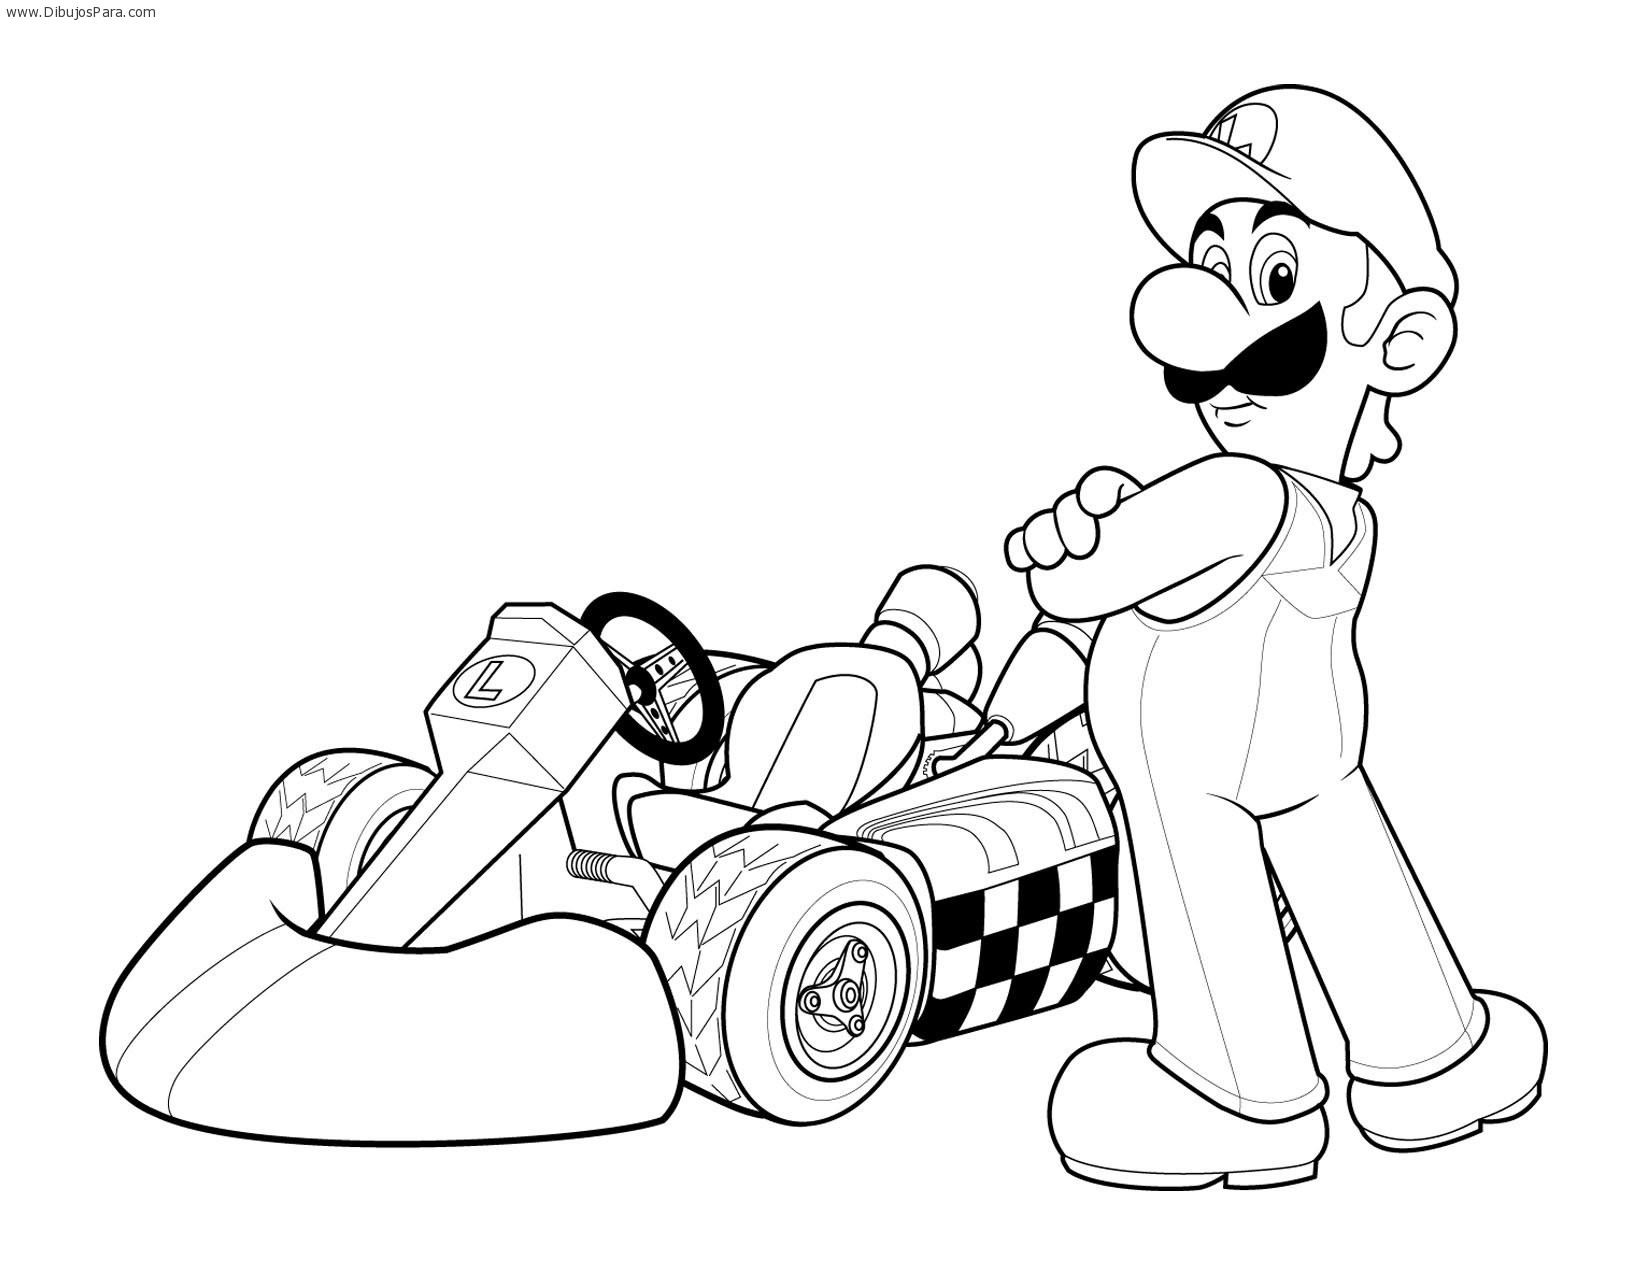 ... de Luigi | Dibujos de Karting para Pintar | Dibujos para Colorear